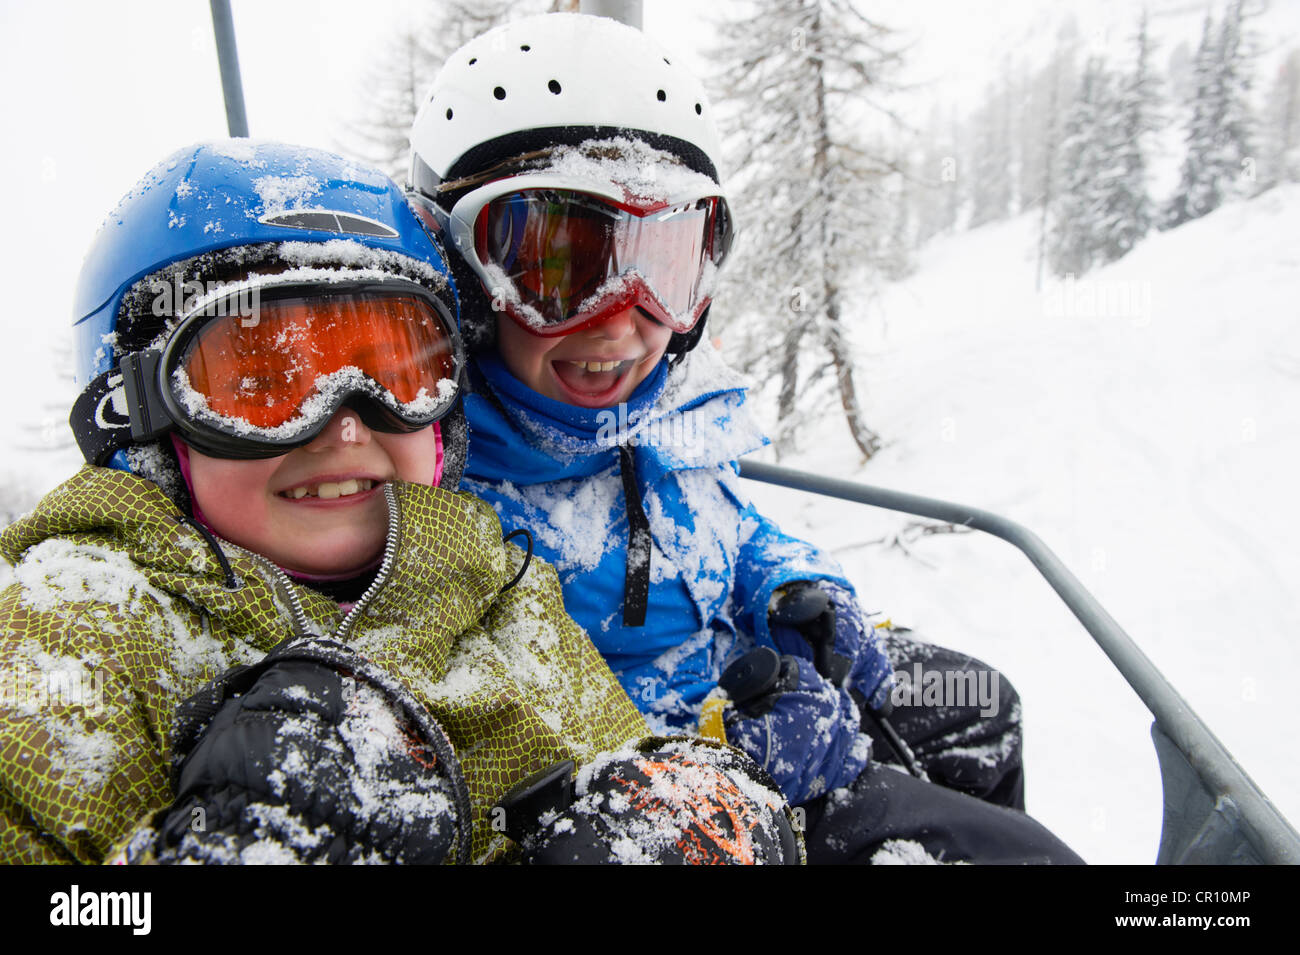 Snow-covered children in ski lift - Stock Image